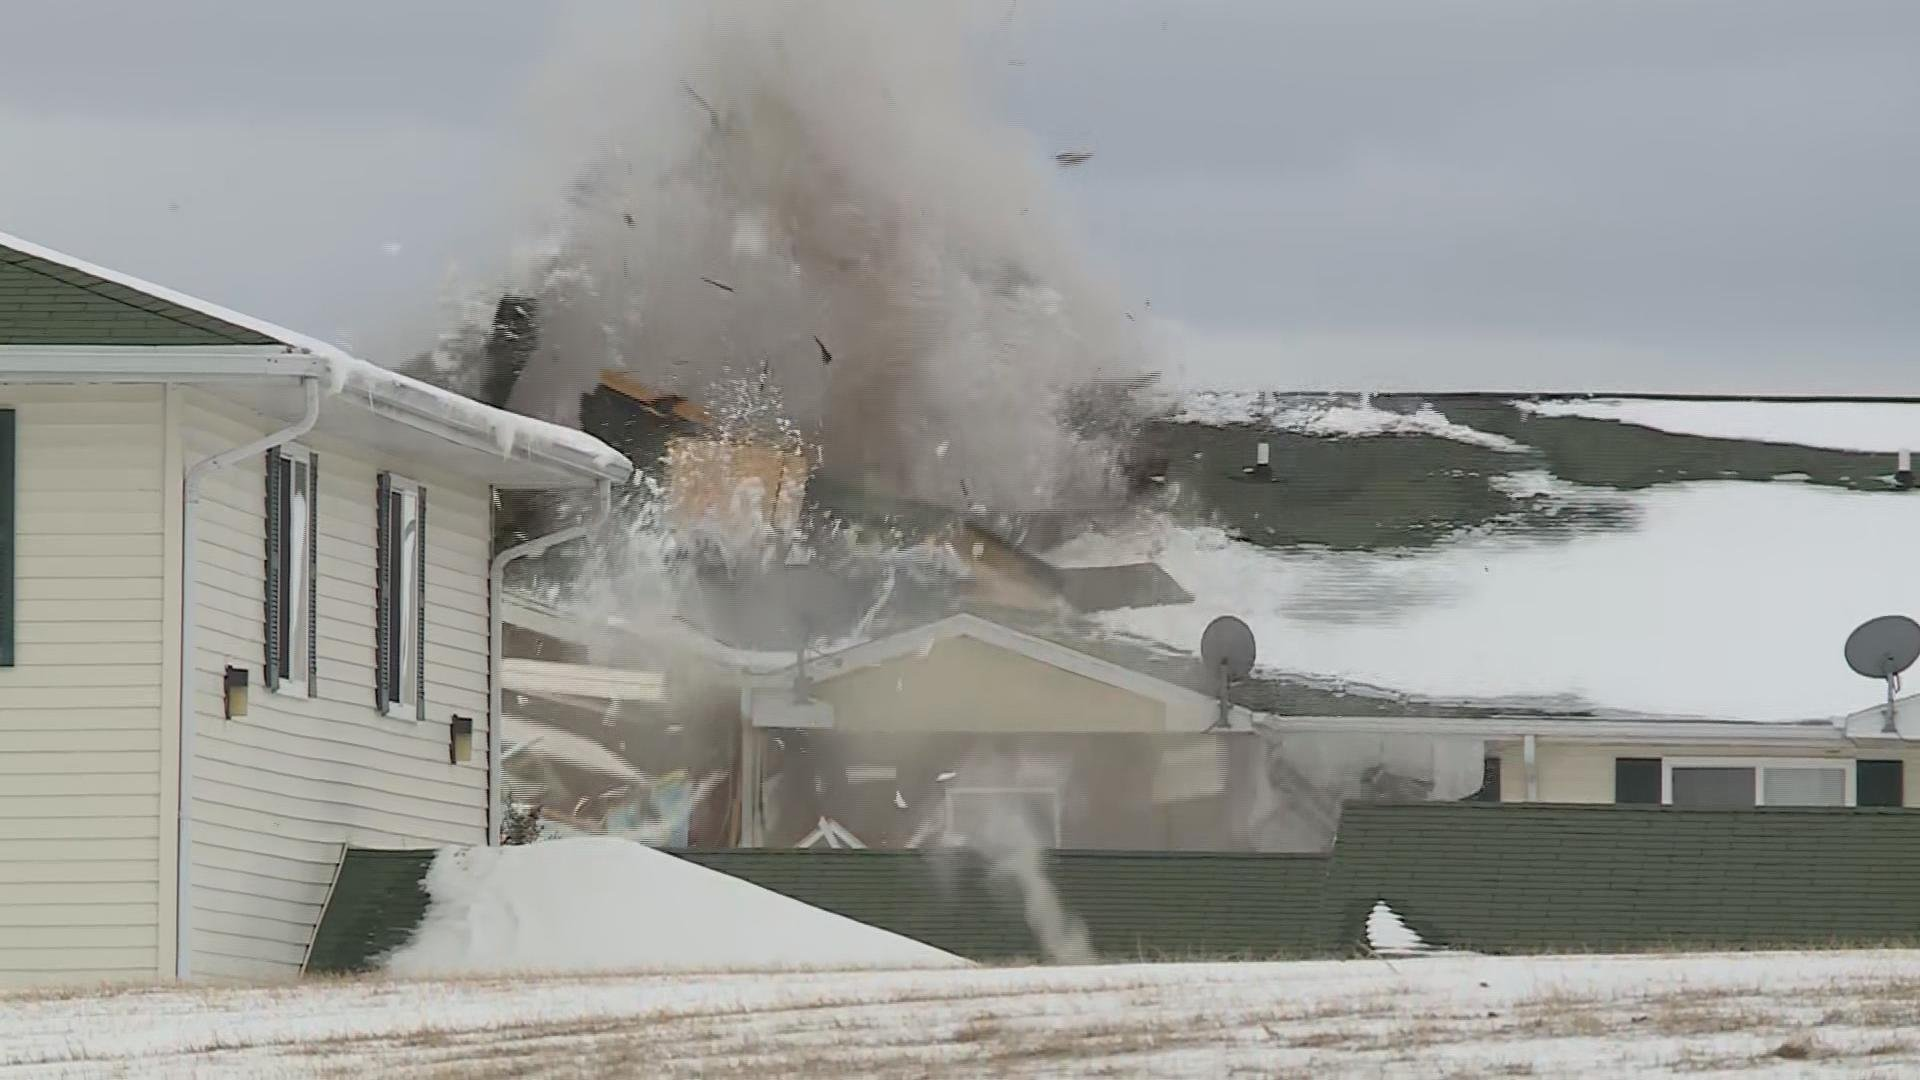 Photo of controlled detonation inside Beaver Dam apartment building